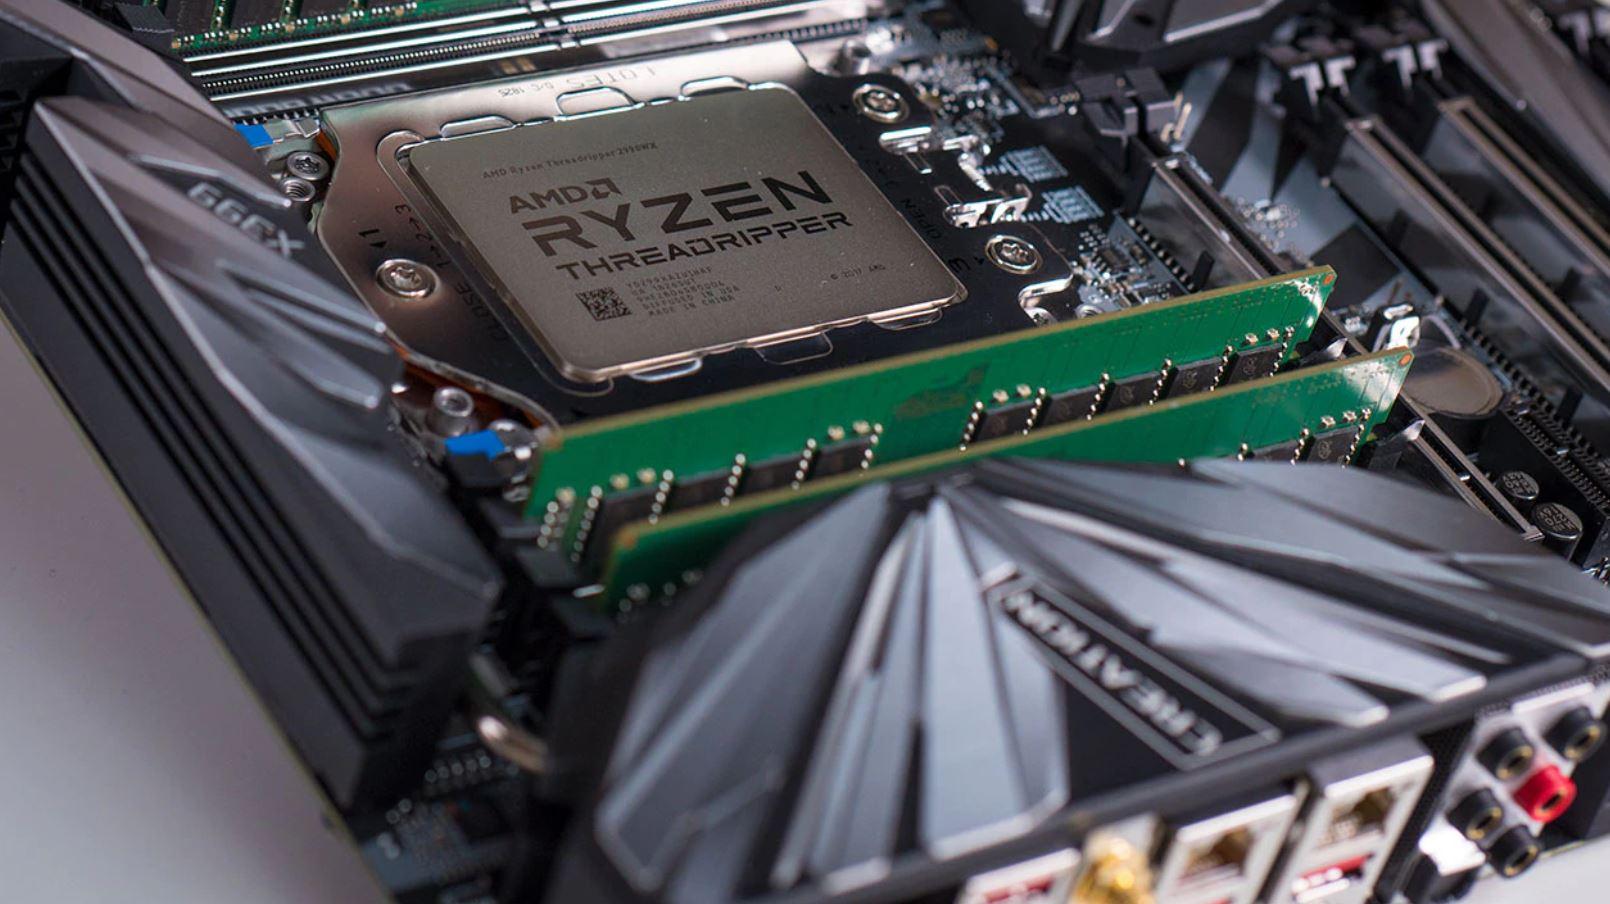 Media asset in full size related to 3dfxzone.it news item entitled as follows: AMD non dovrebbe cambiare partner per la produzione dei chip a 3nm e a 5nm   Image Name: news31648_AMD-CPU_1.jpg